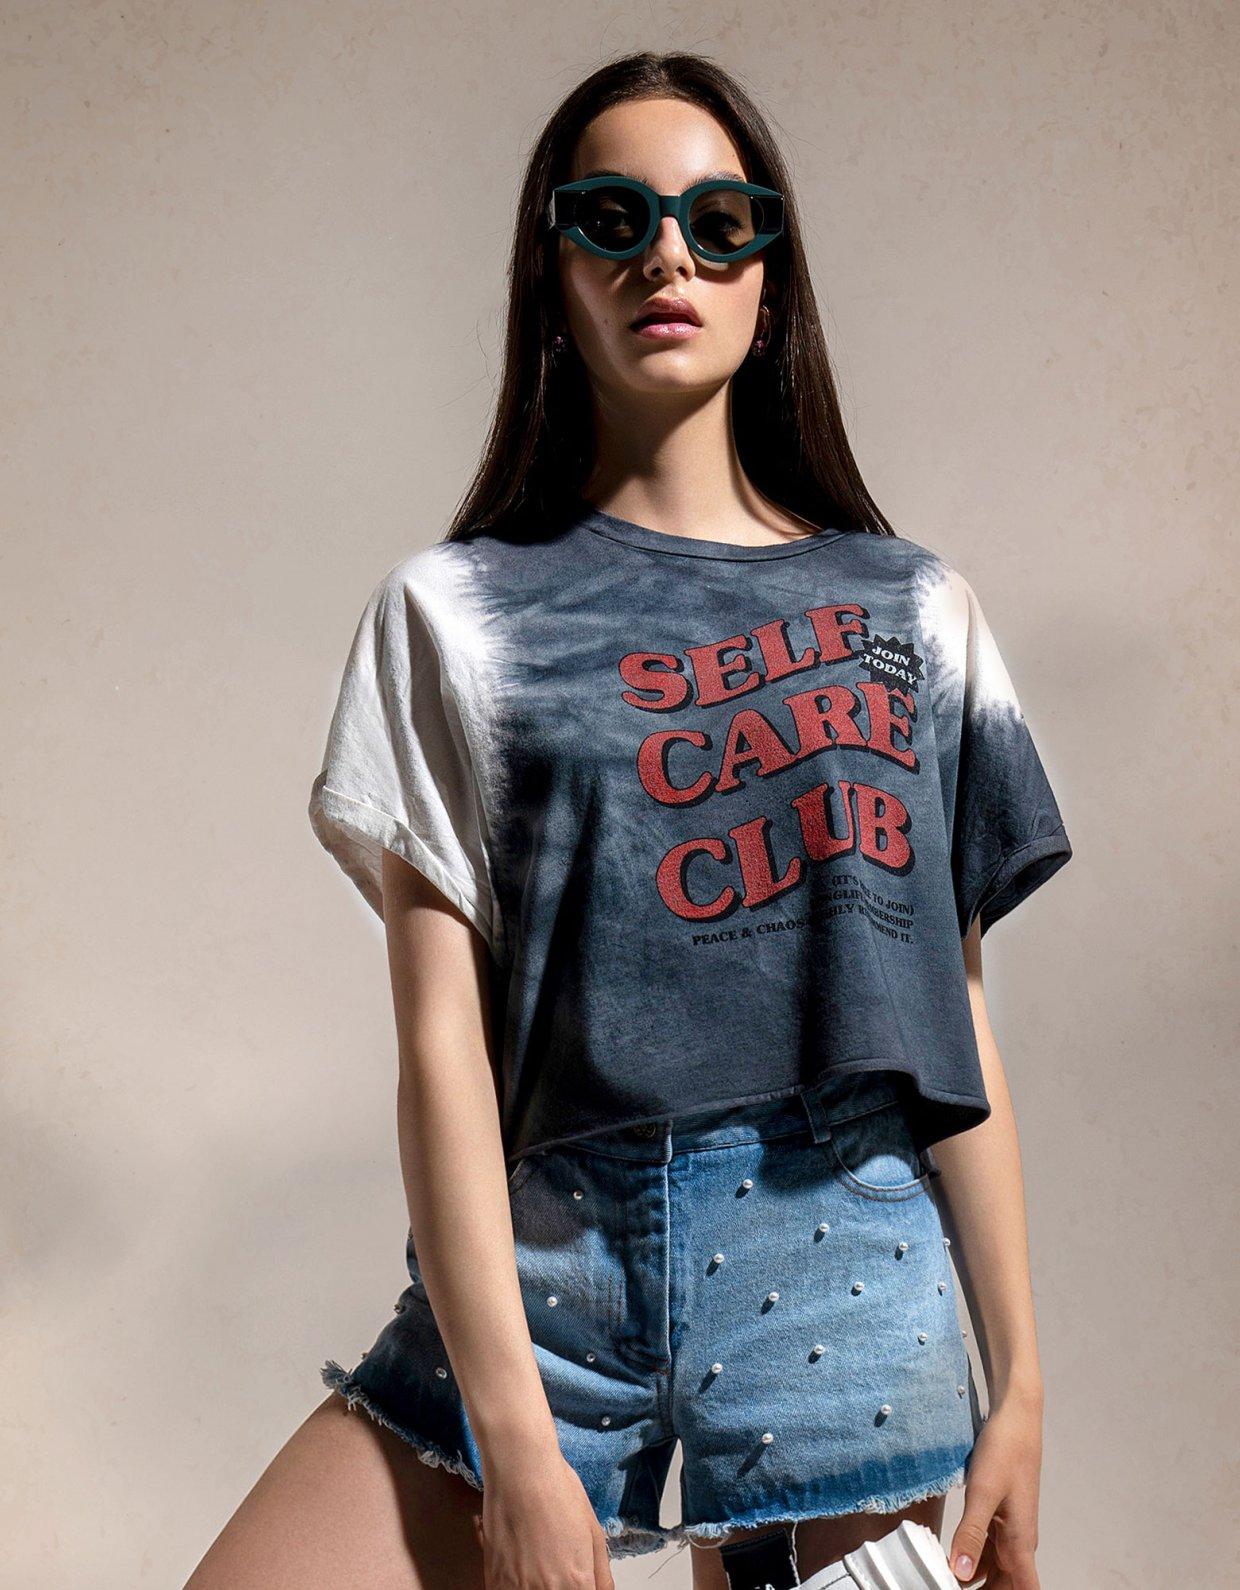 Peace & Chaos Self care club t-shirt